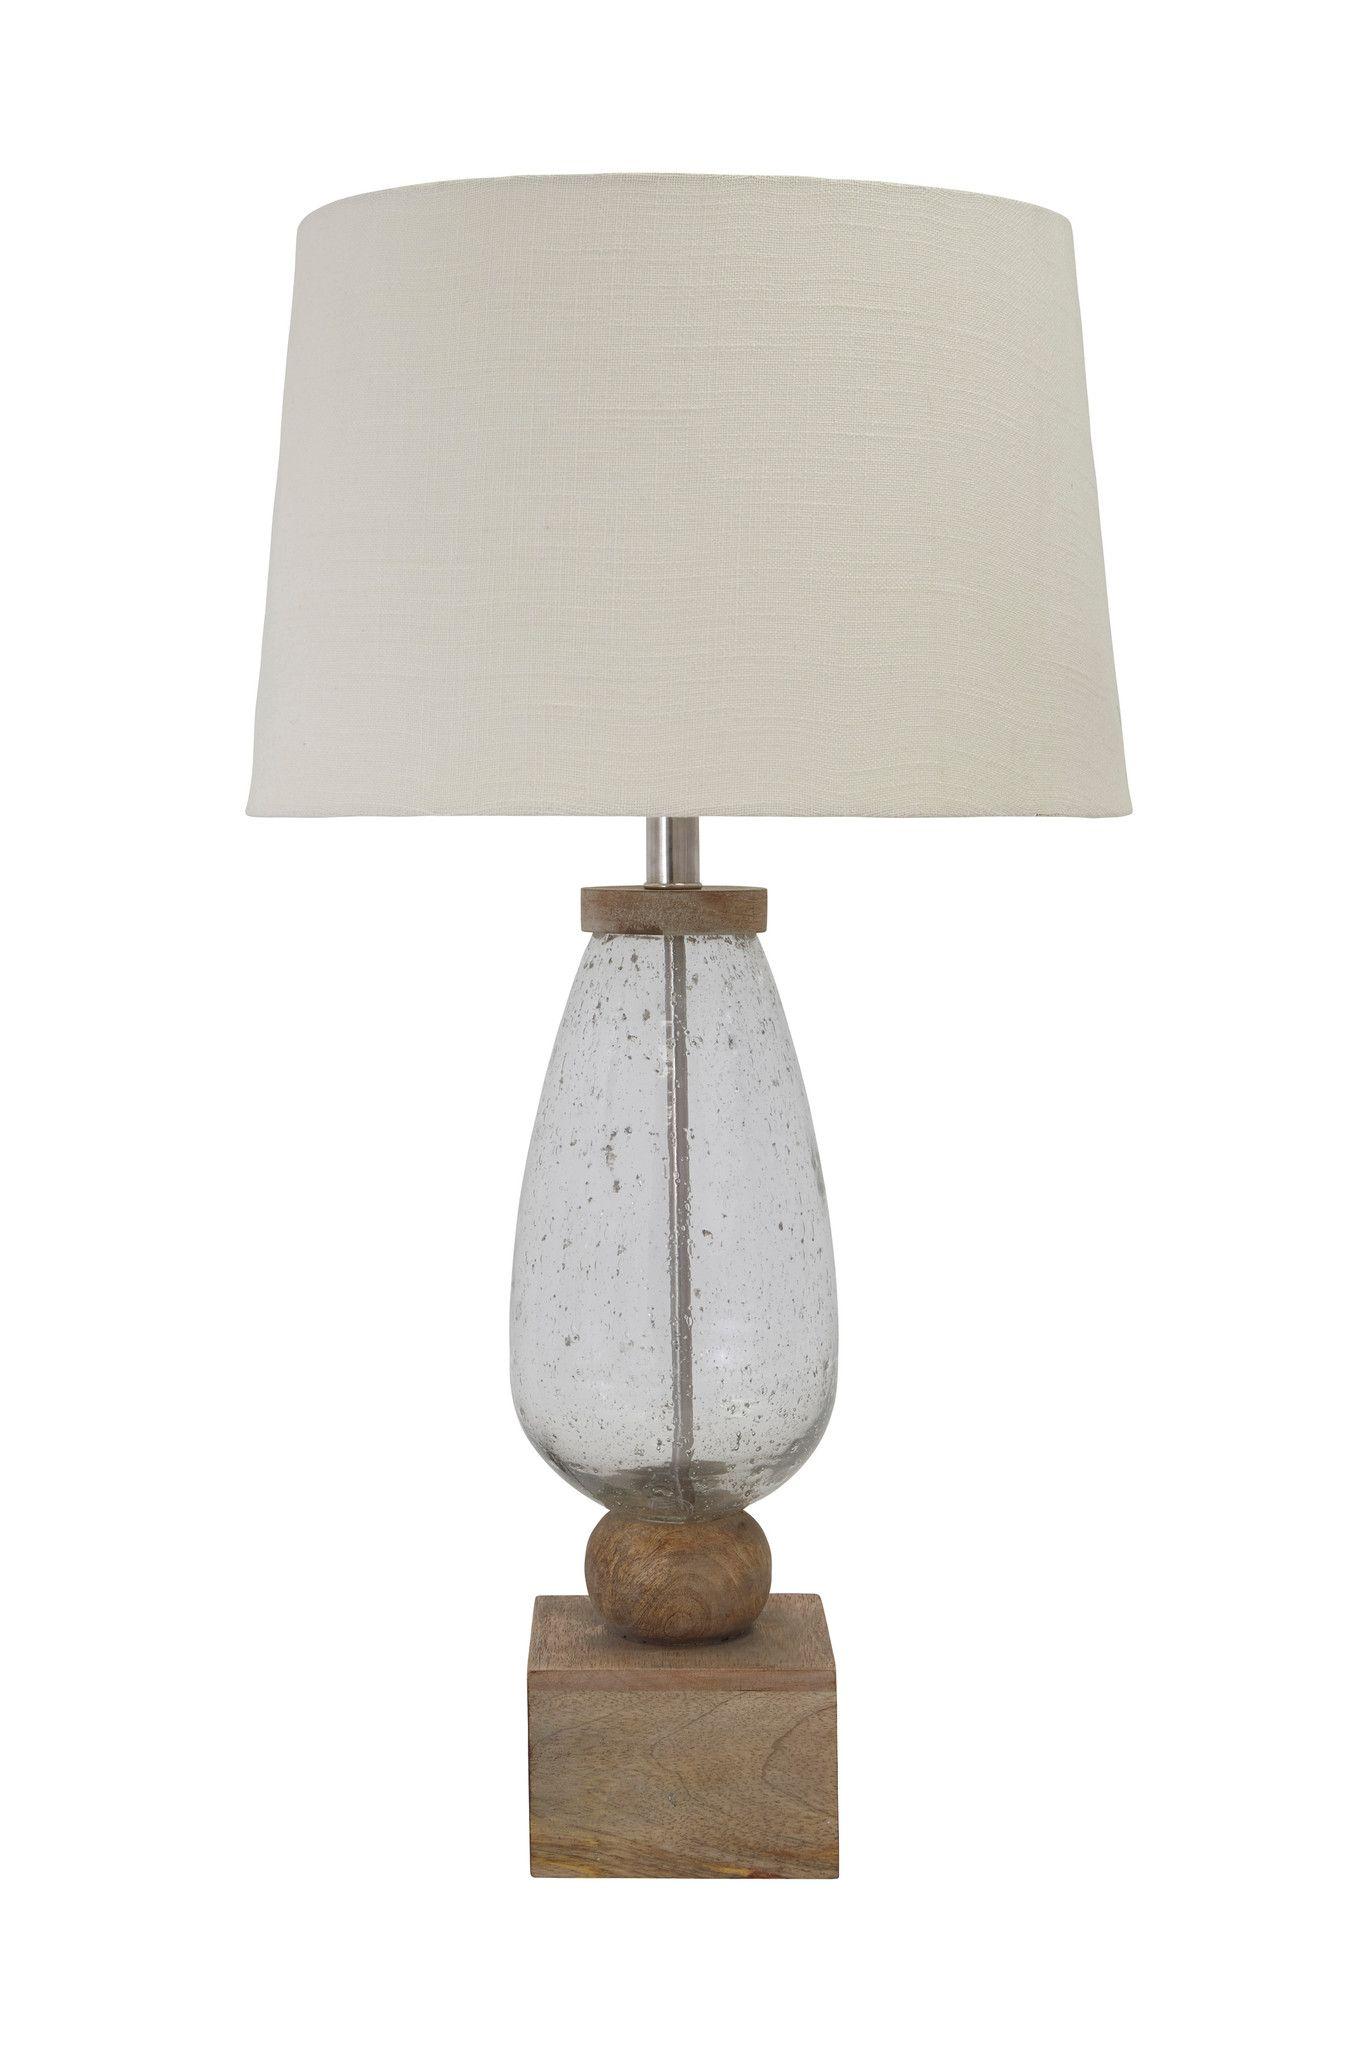 Glass Table Lamp Table Lamp Wood Table Lamp Glass